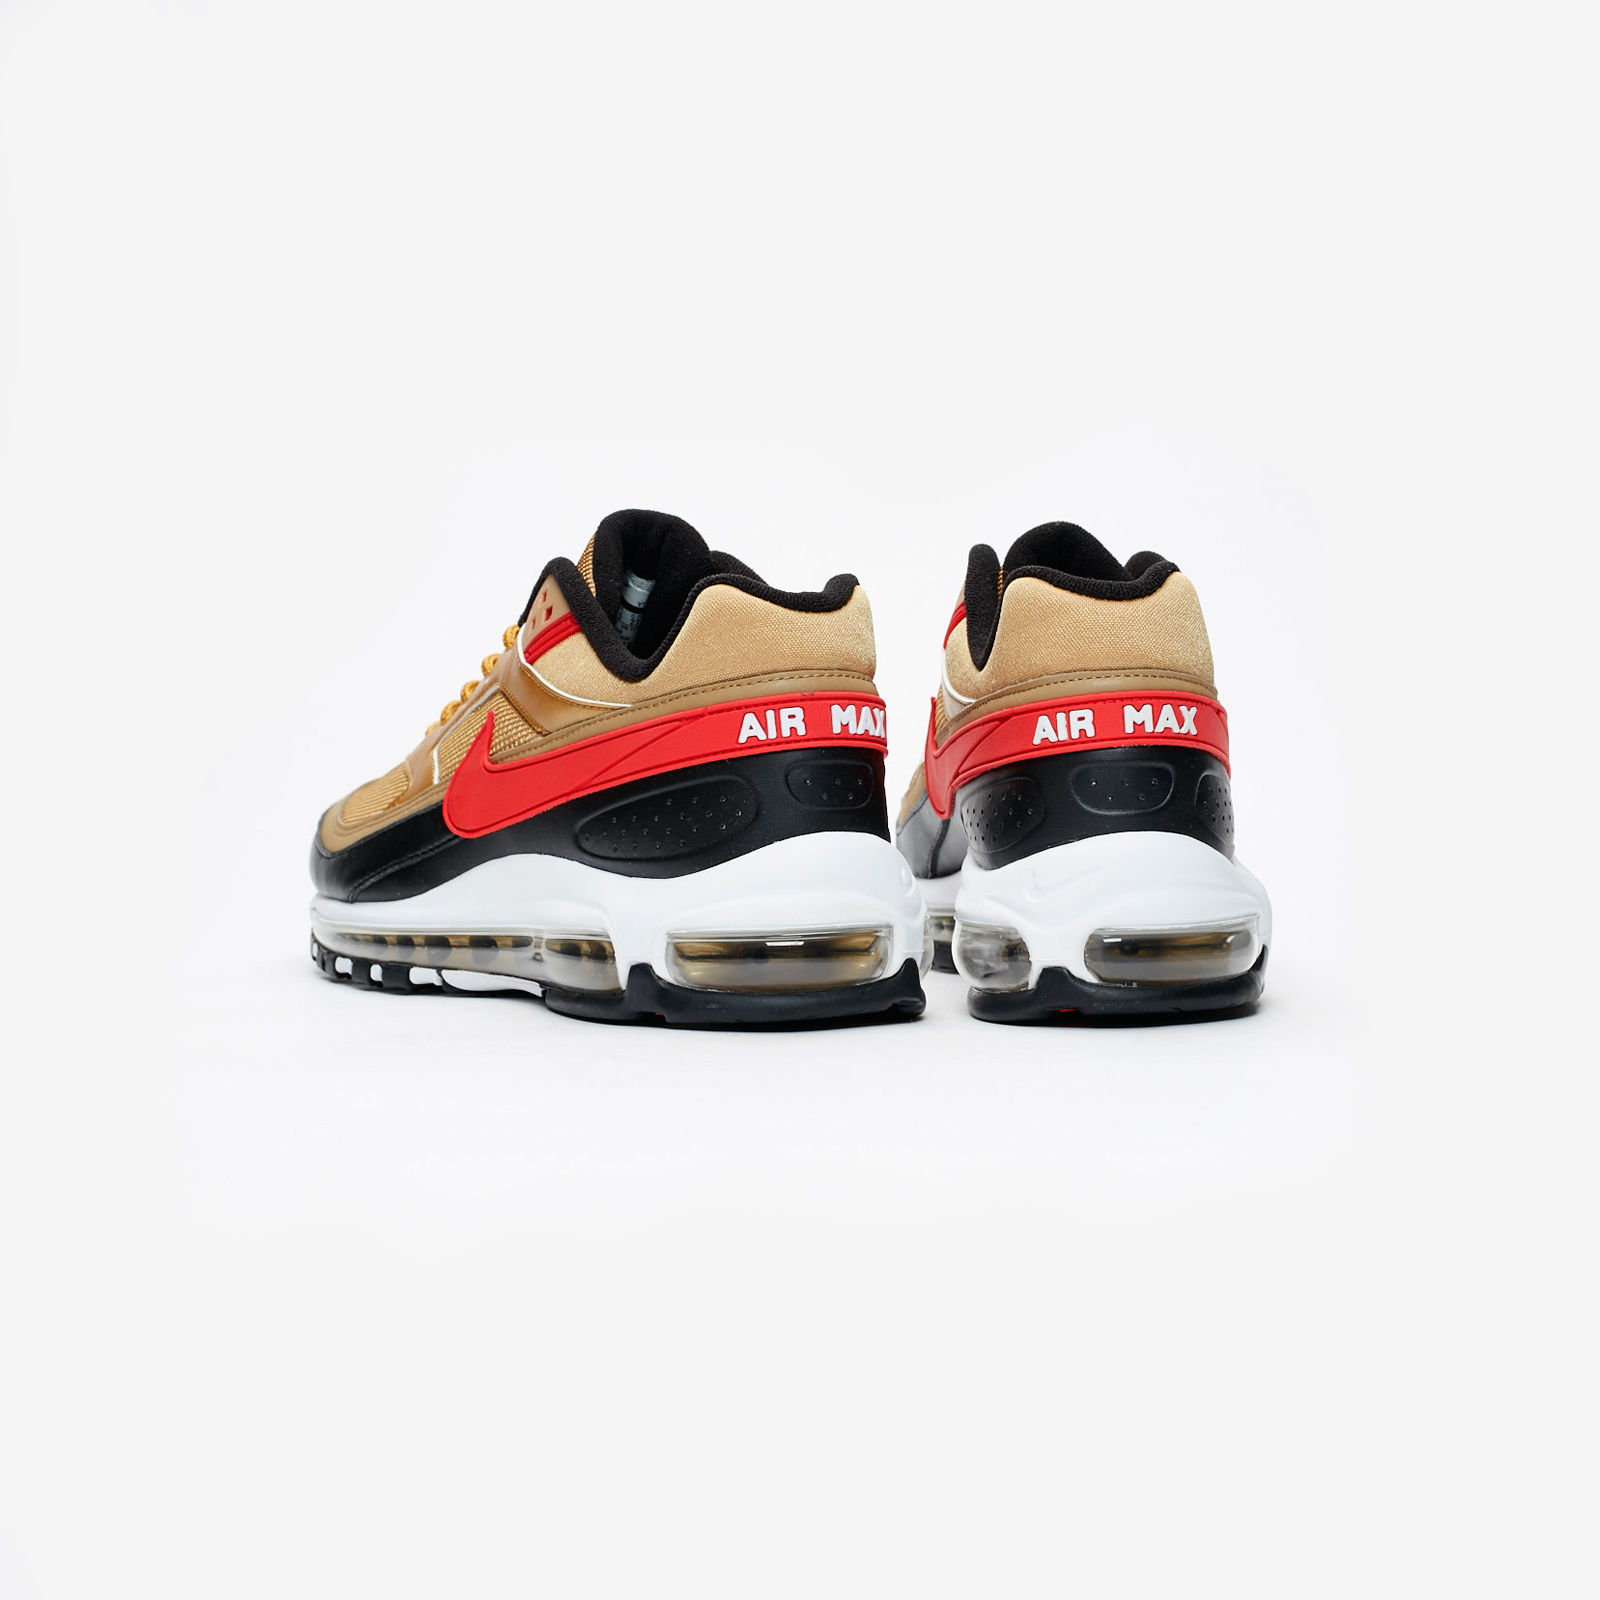 Nike Air Max 97BW Ao2406 700 Sneakersnstuff | sneakers